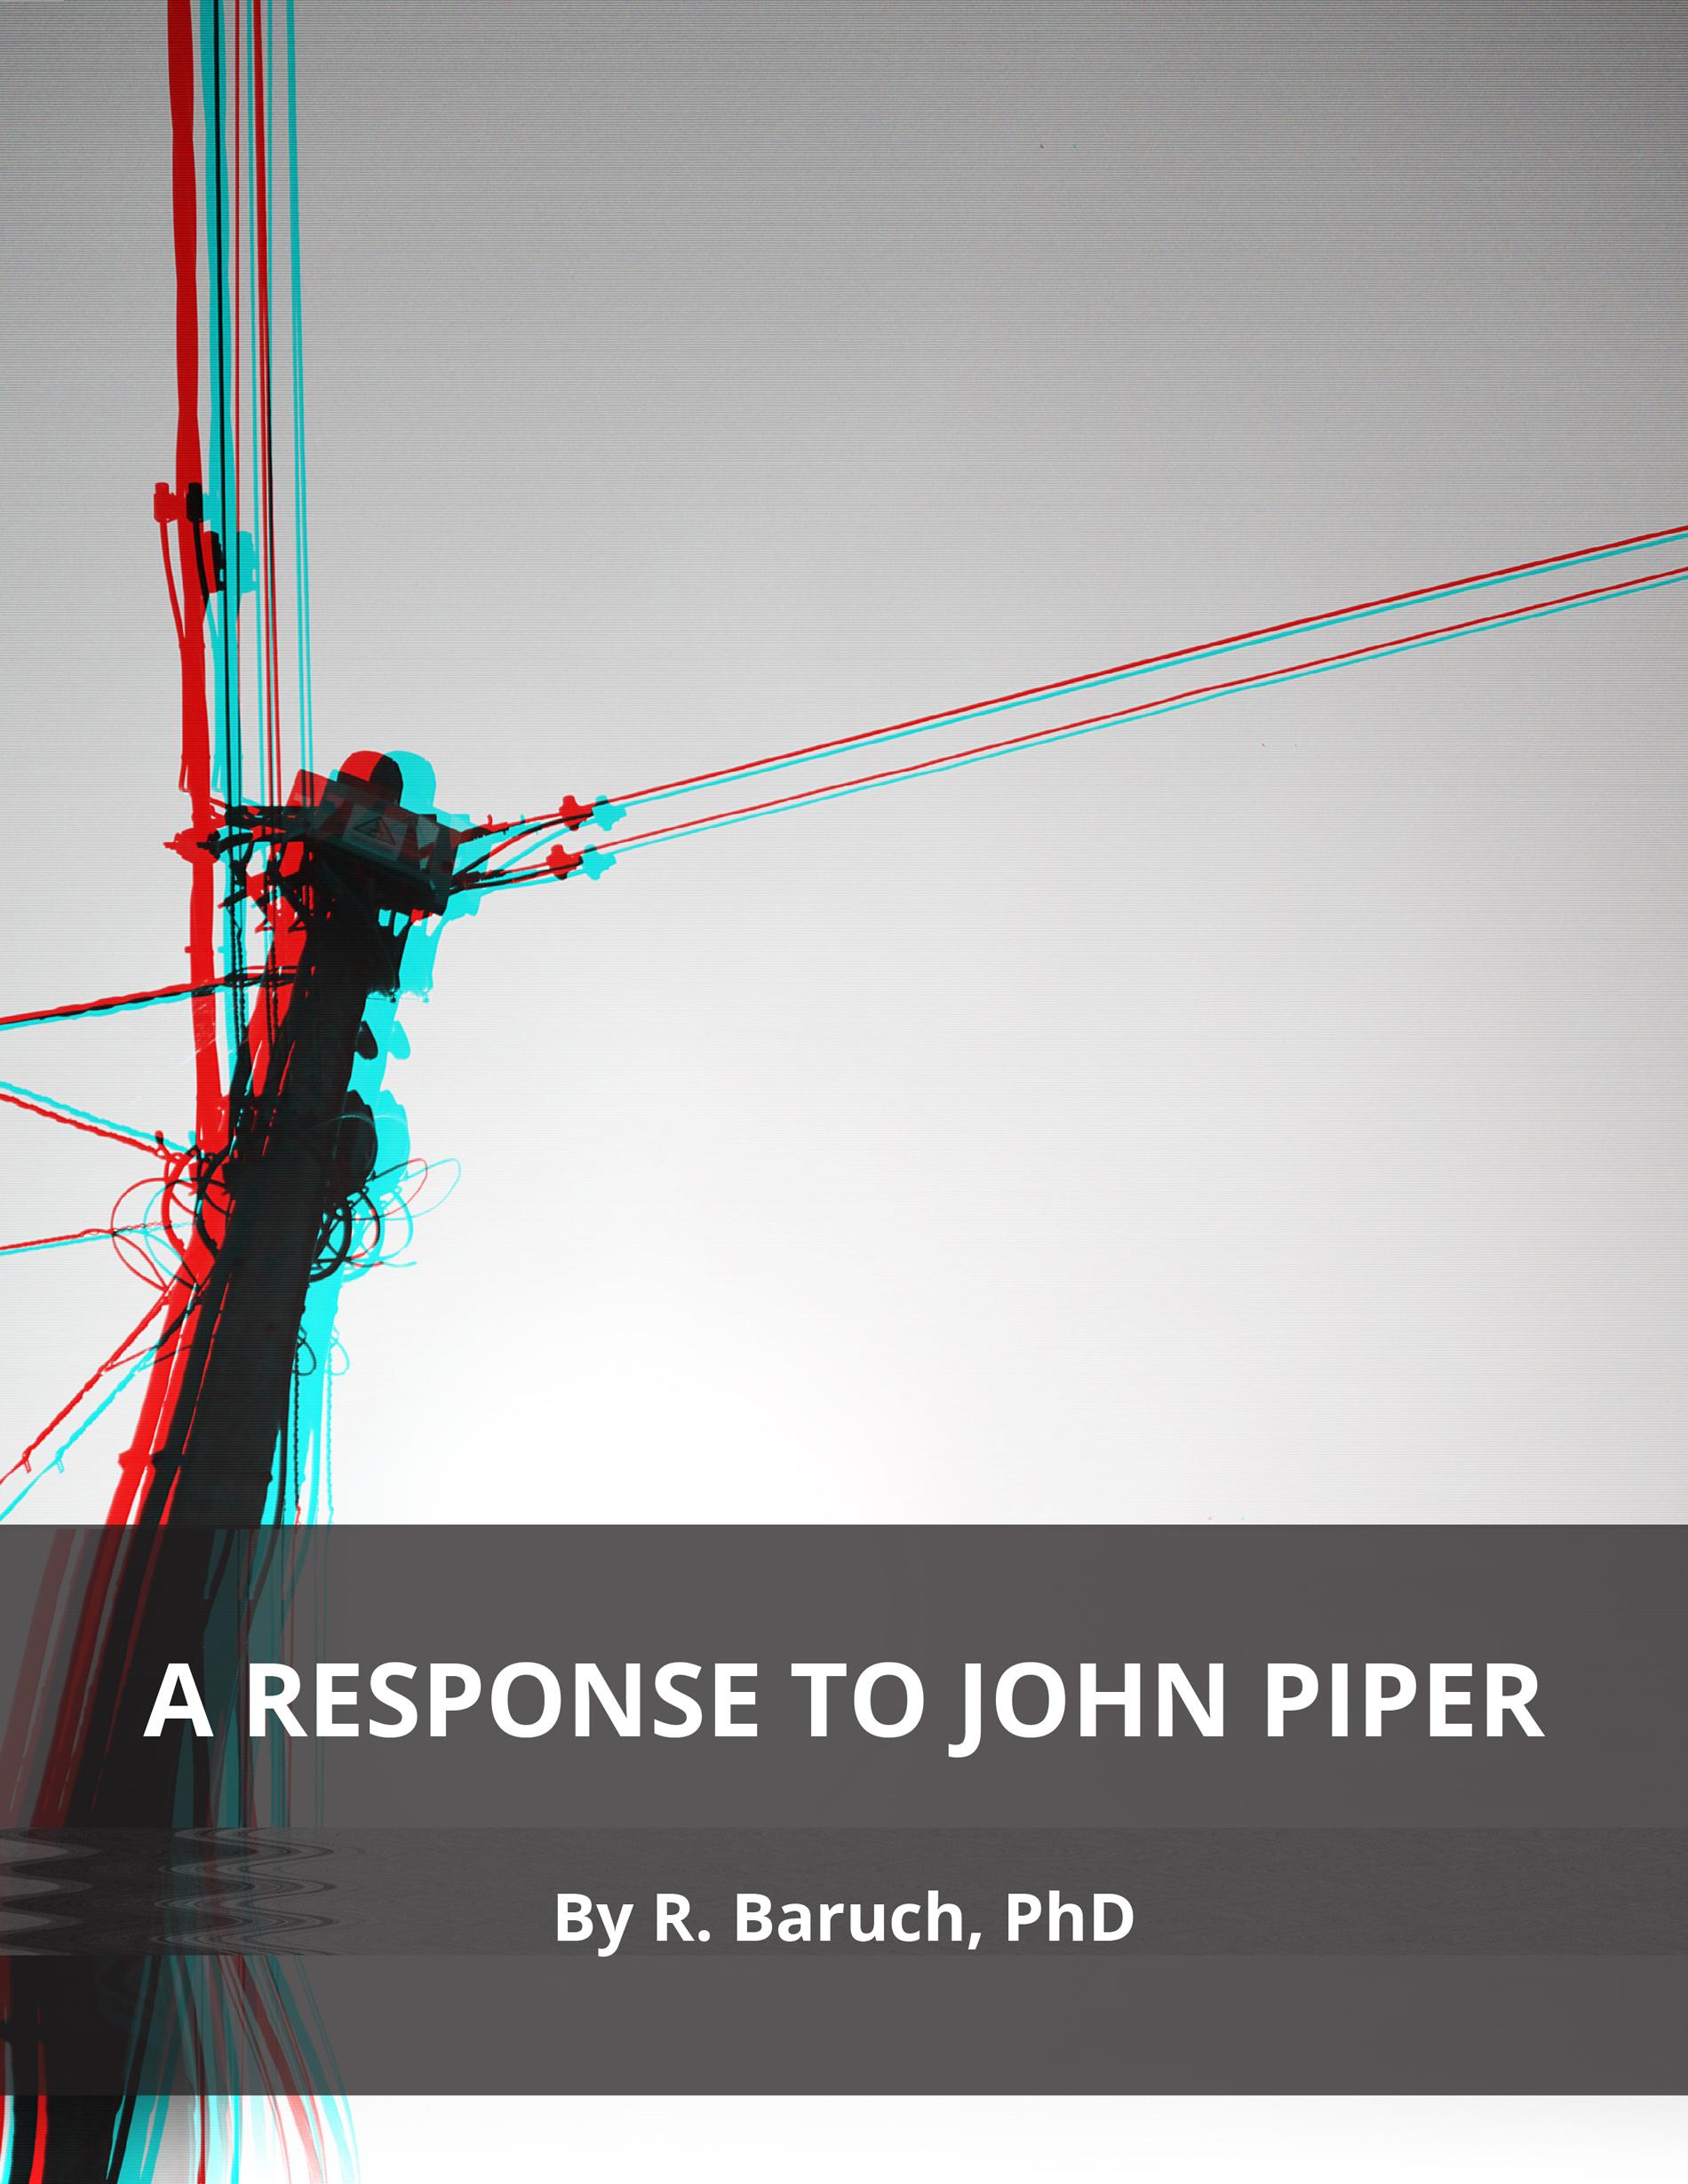 Response to John Piper